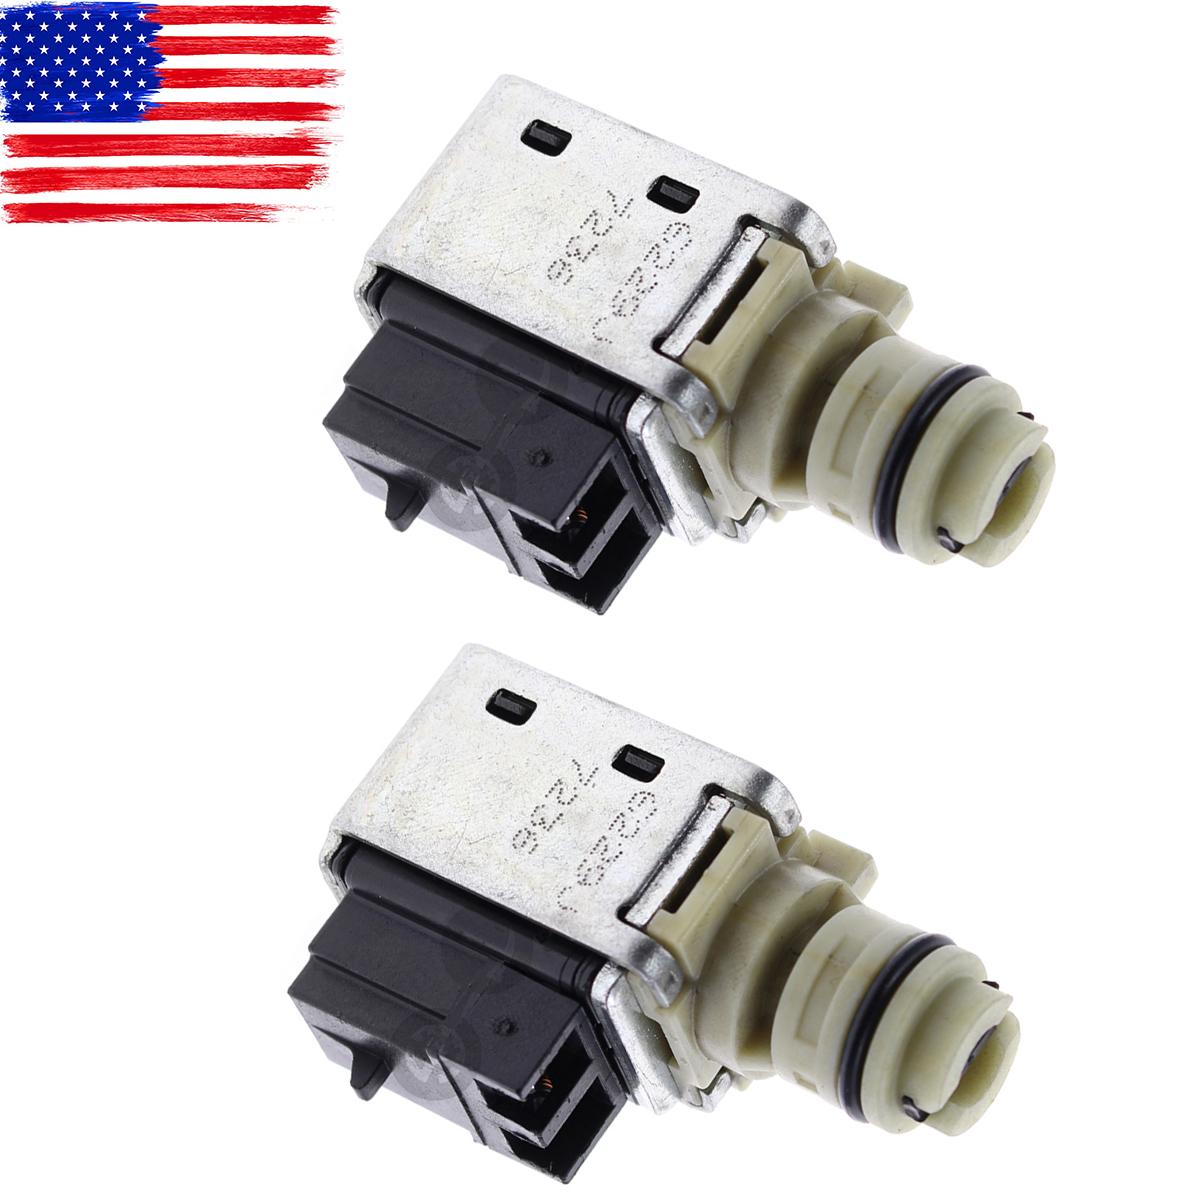 2 Oem 4t40e 4t45e Transmission Shift Solenoid For Saturn Vue Aura Repair Ion L300 Ls Lw